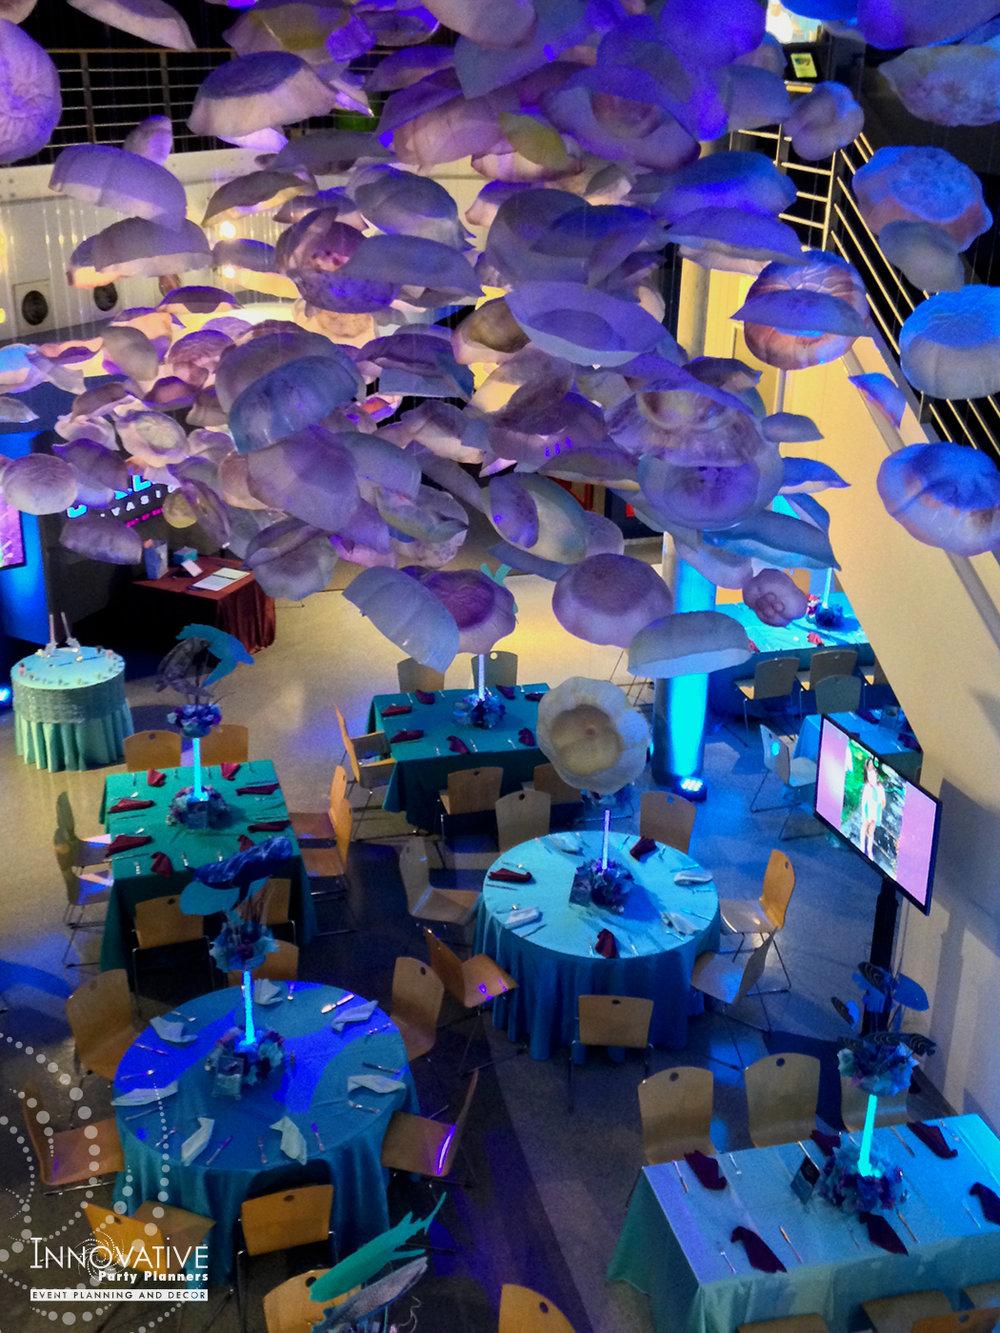 Arielles Aquarium   Bat Mitzvah Tables   Under the sea, aquarium theme, decor Bat Mitzvah by Innovative Party Planners at the National Aquarium